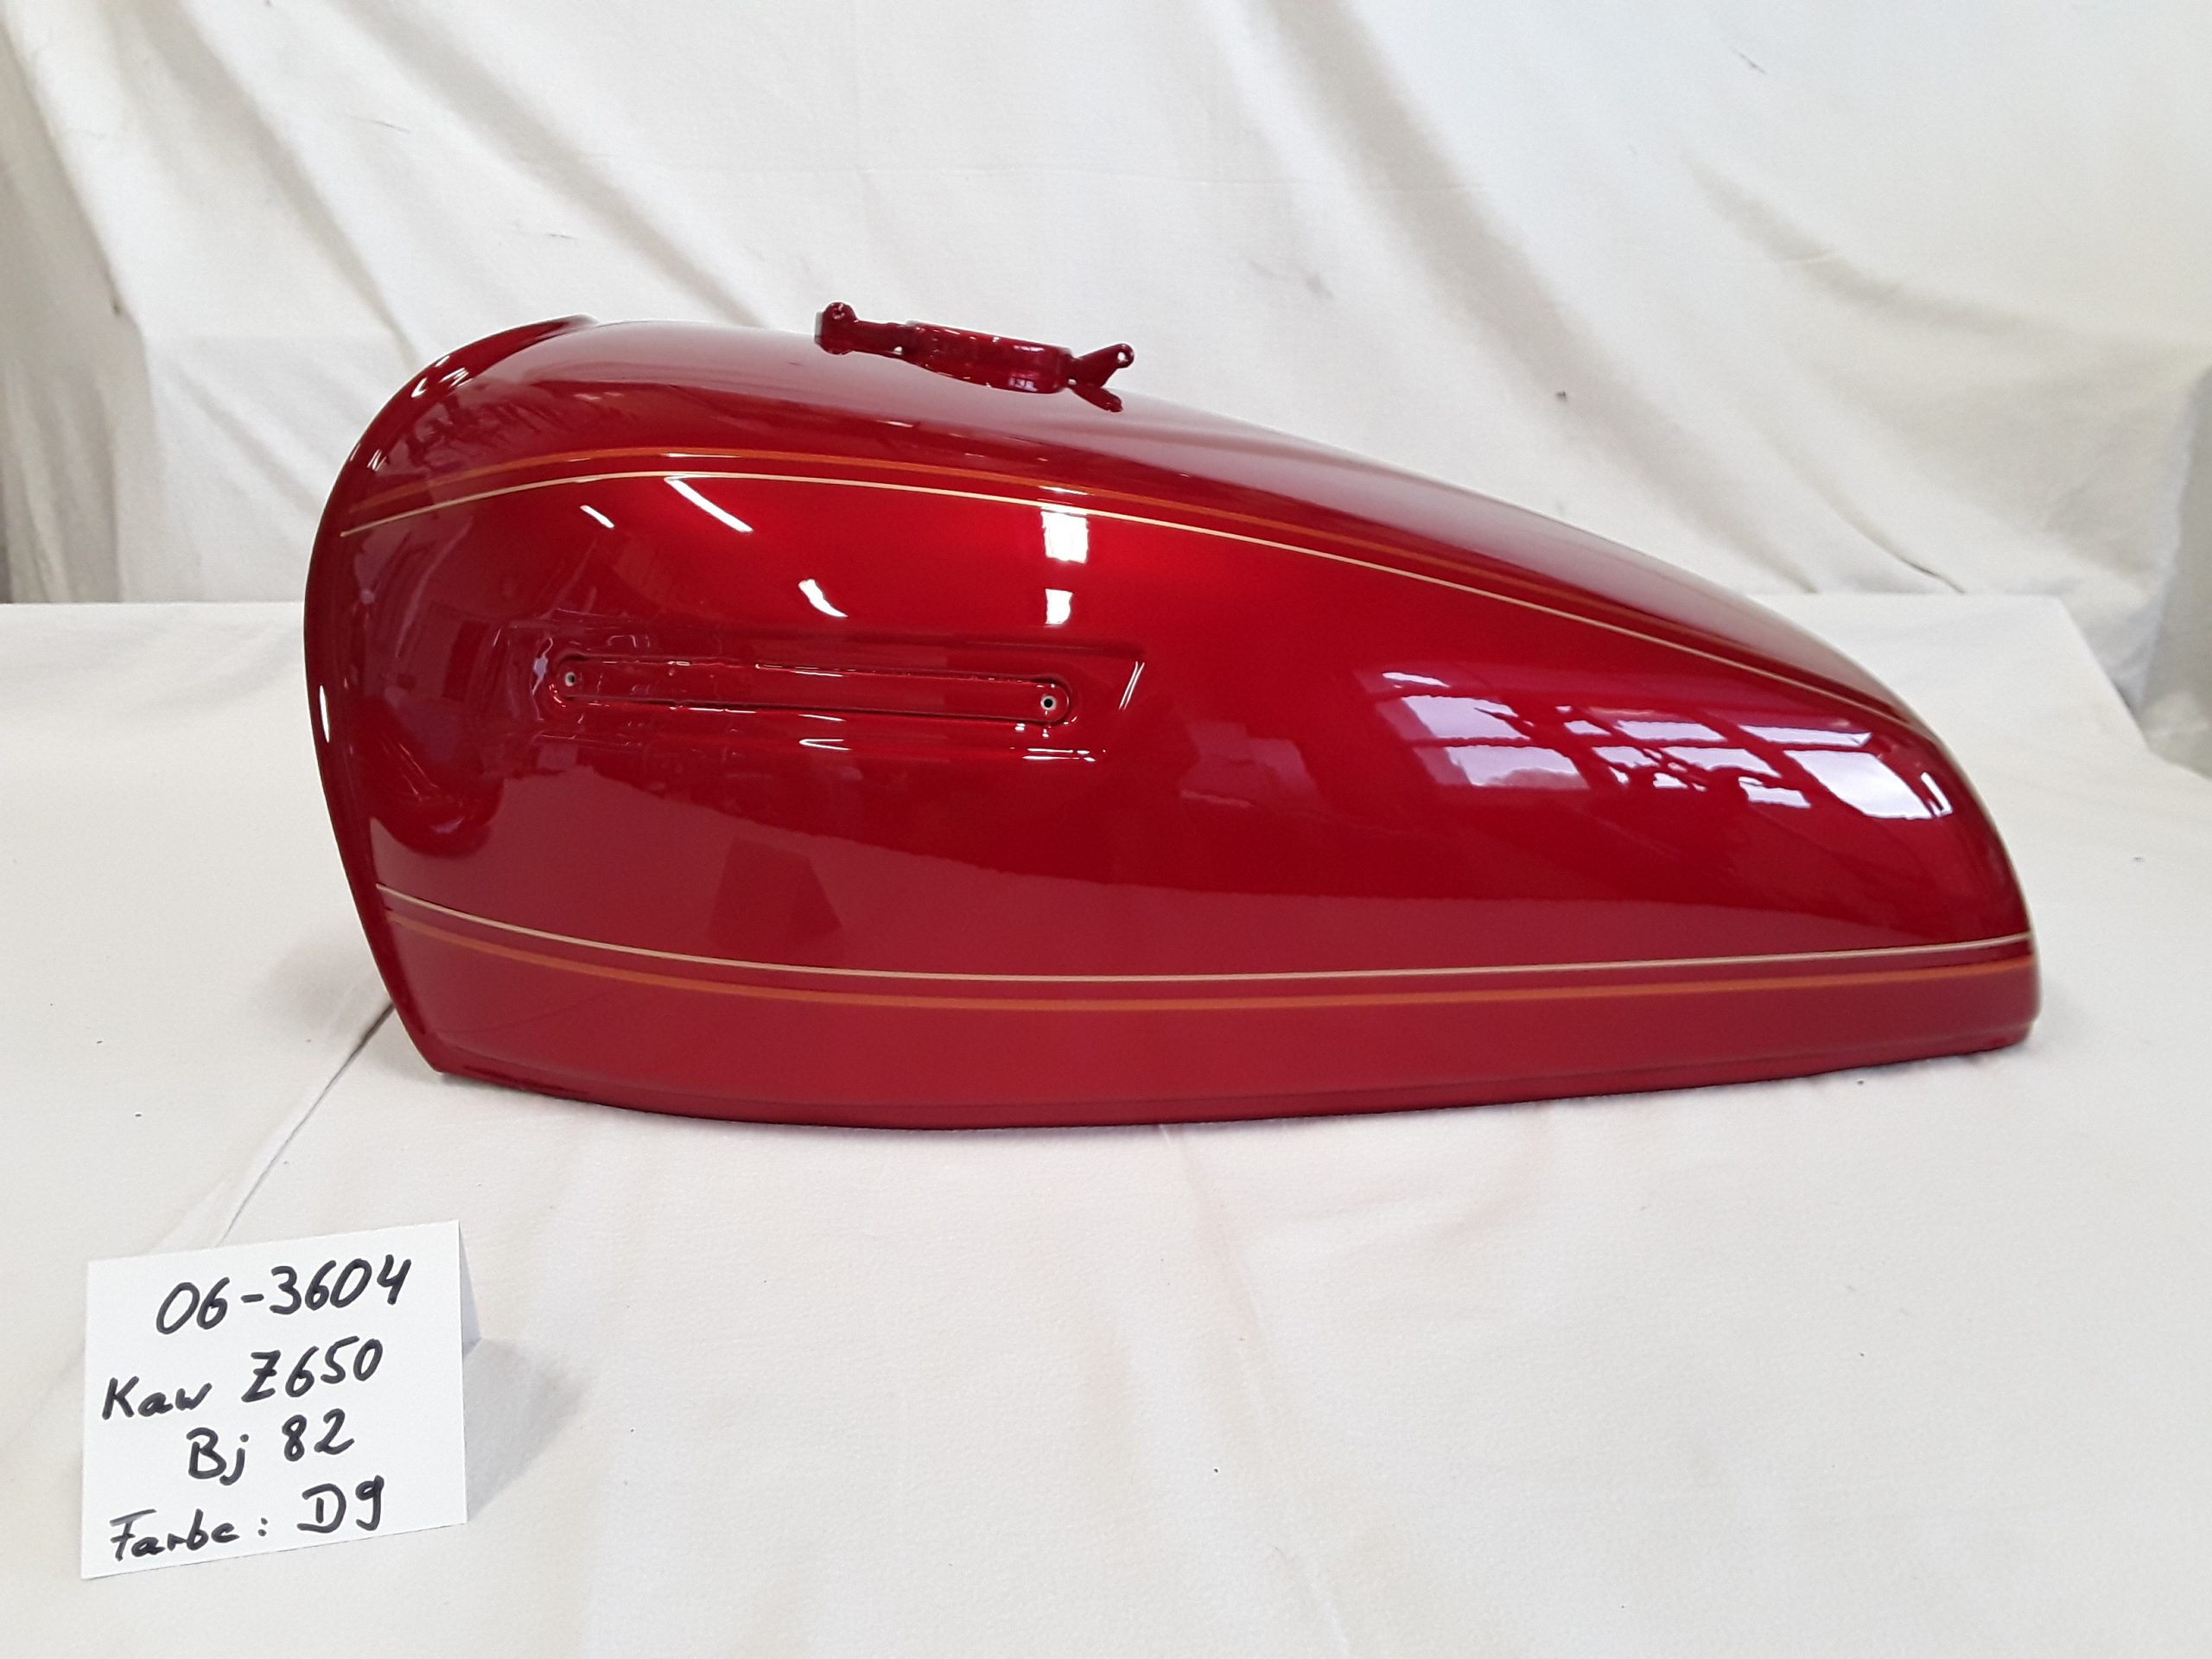 Kawasaki Z650 '82 in luminous passion red D9 RH-Lacke Lackiererei Motorradlackierung 06-3604